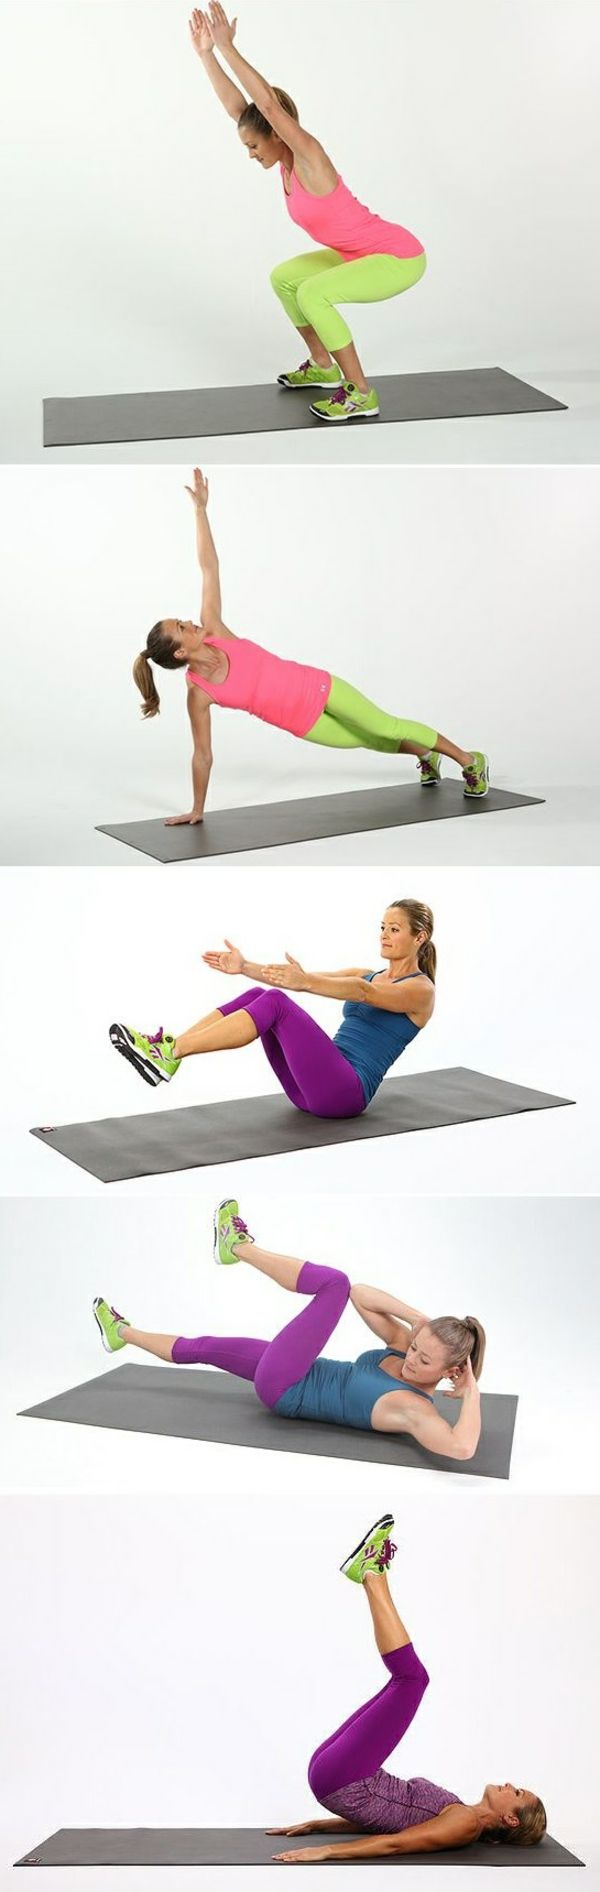 dehnübungen rücken rückenübung rückenmuskulatur stärken rückengymnastik übungen